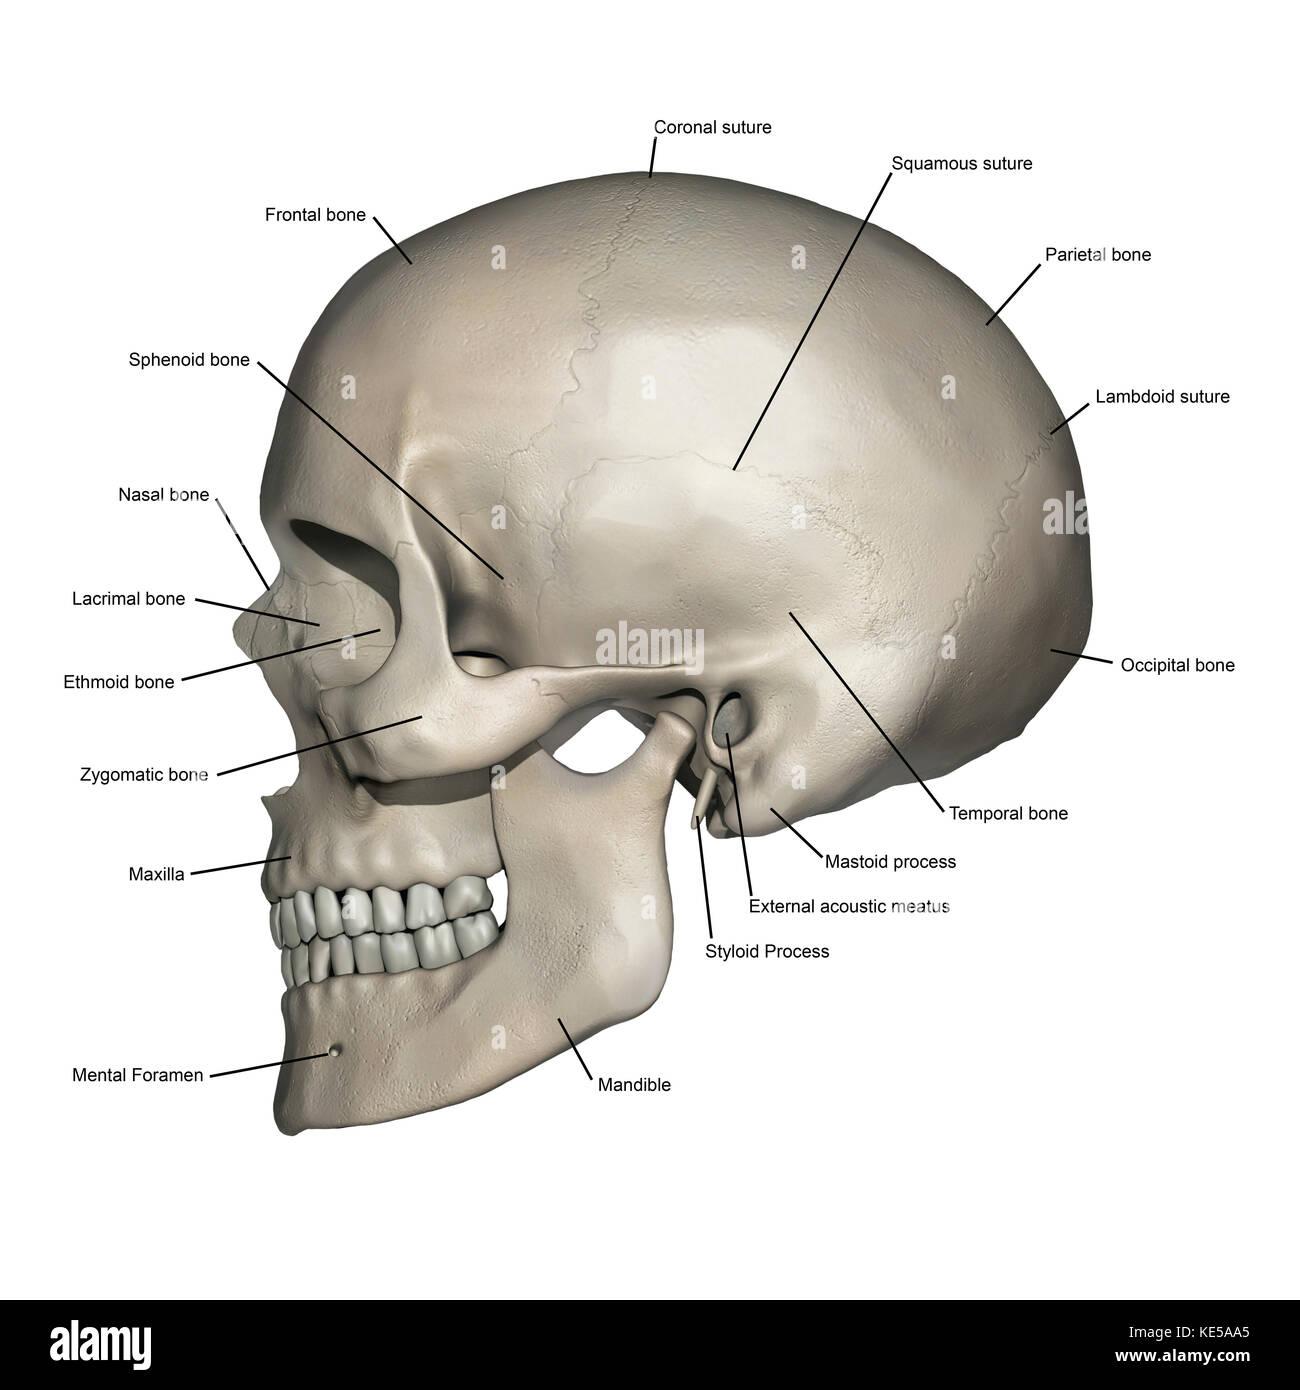 Lateral Vintage Anatomía Humana Completo Cráneo Wwwmiifotoscom